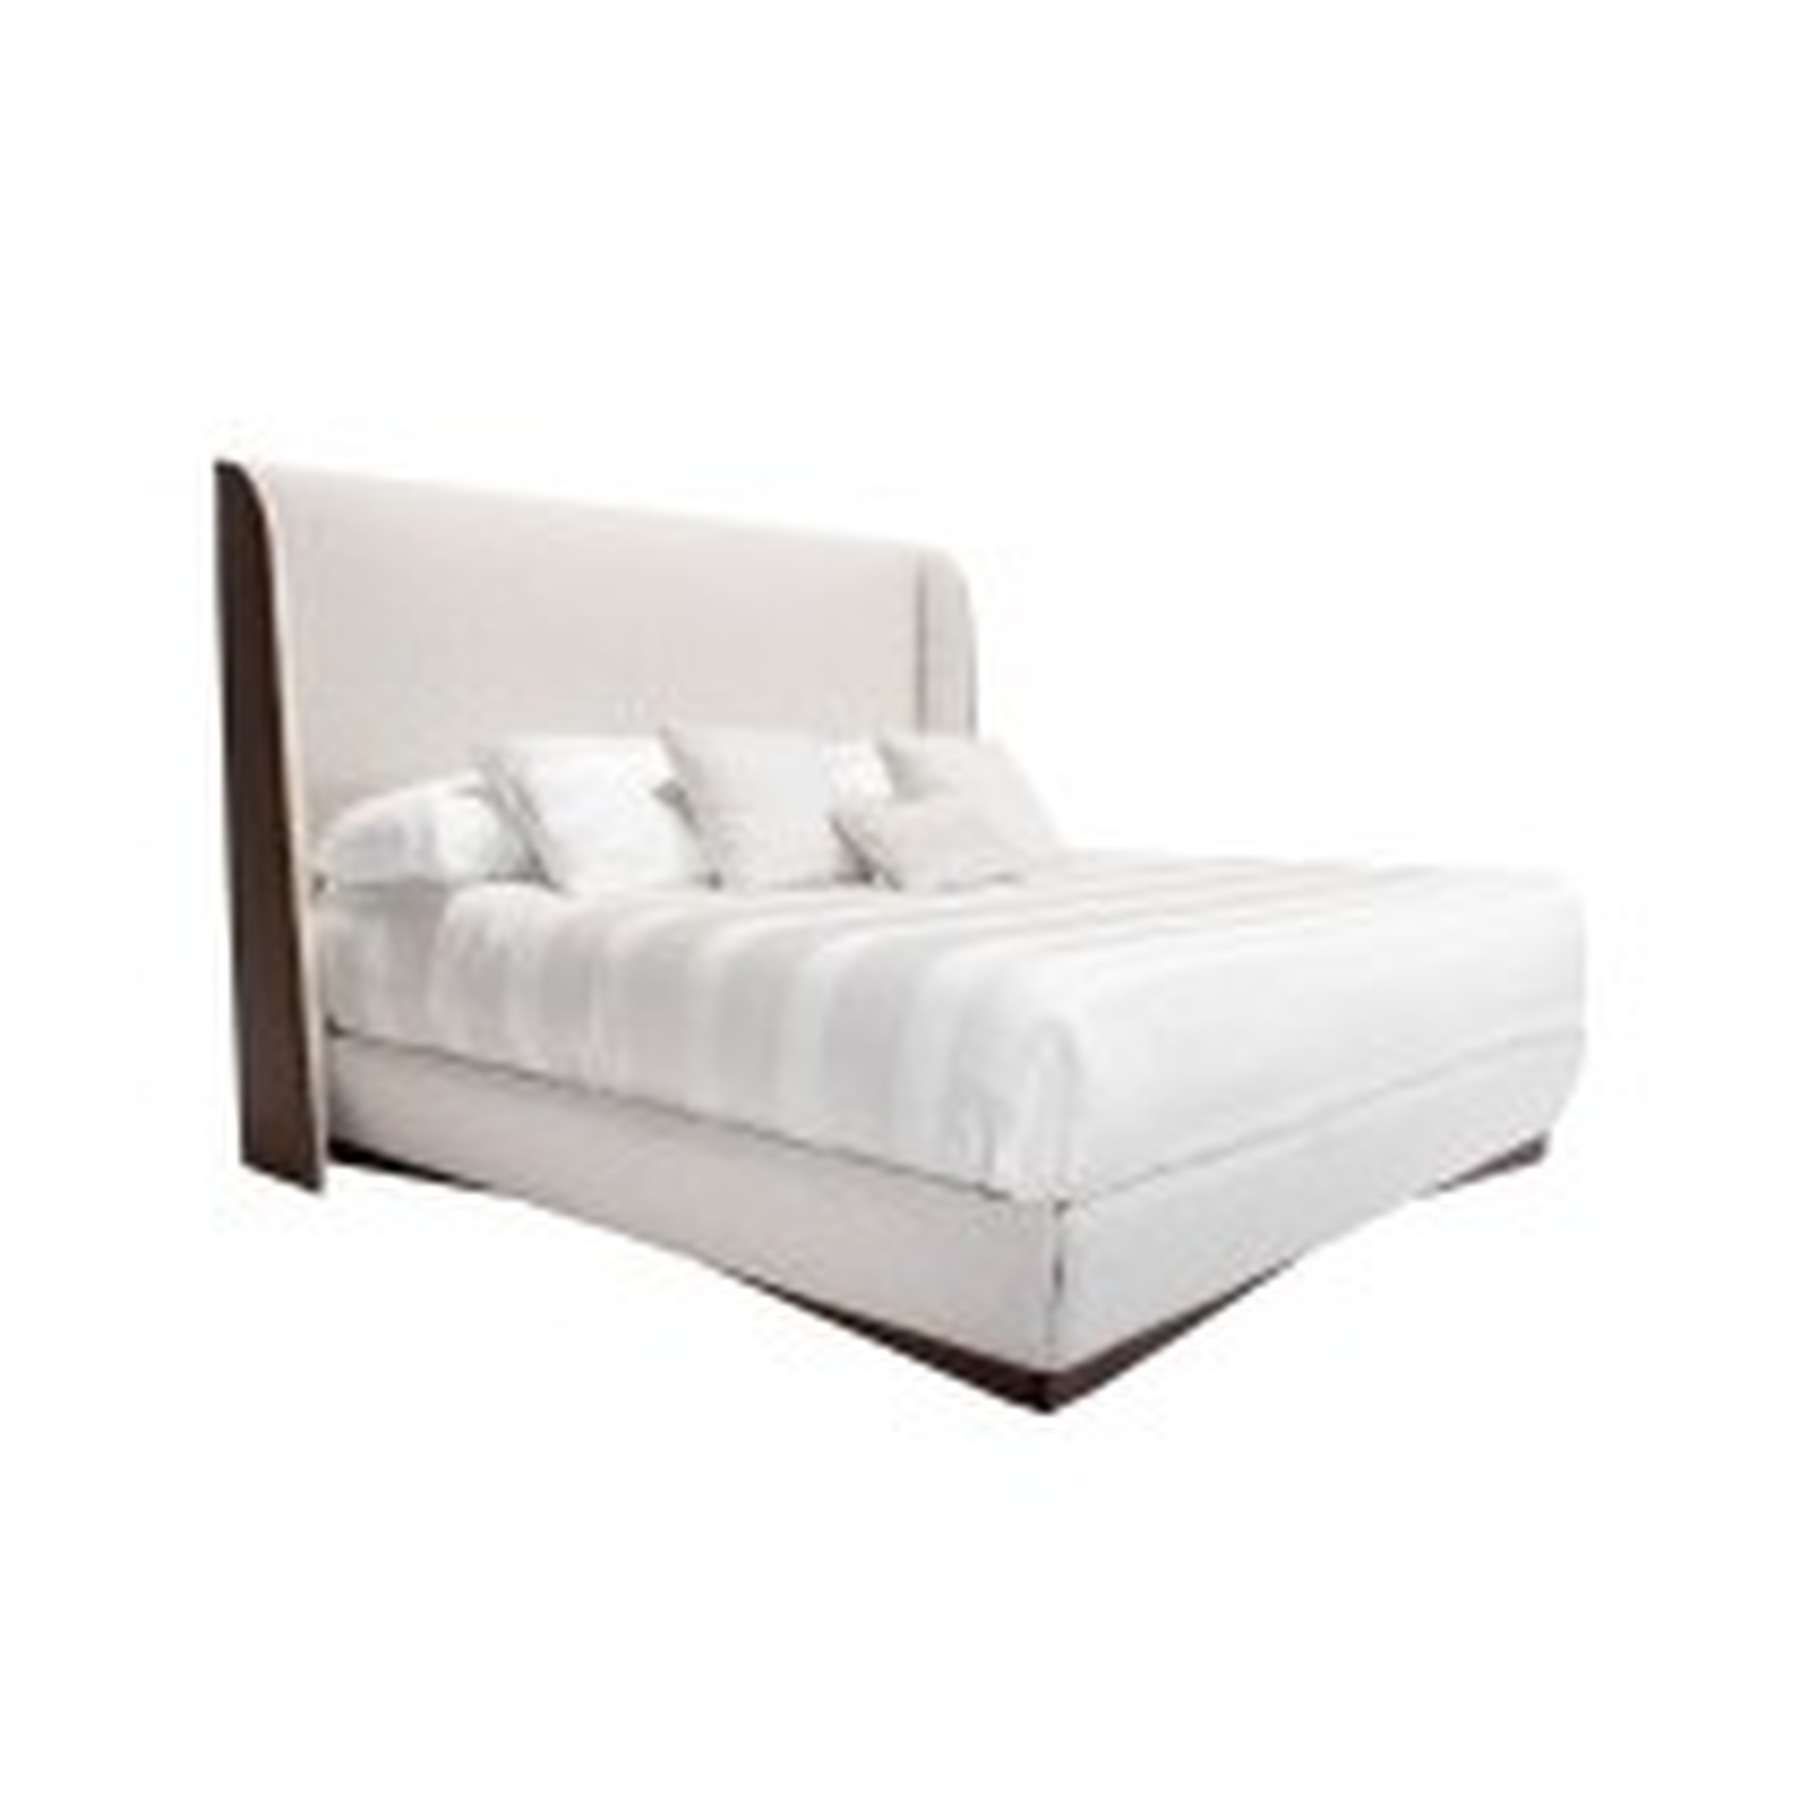 STRATUS BED